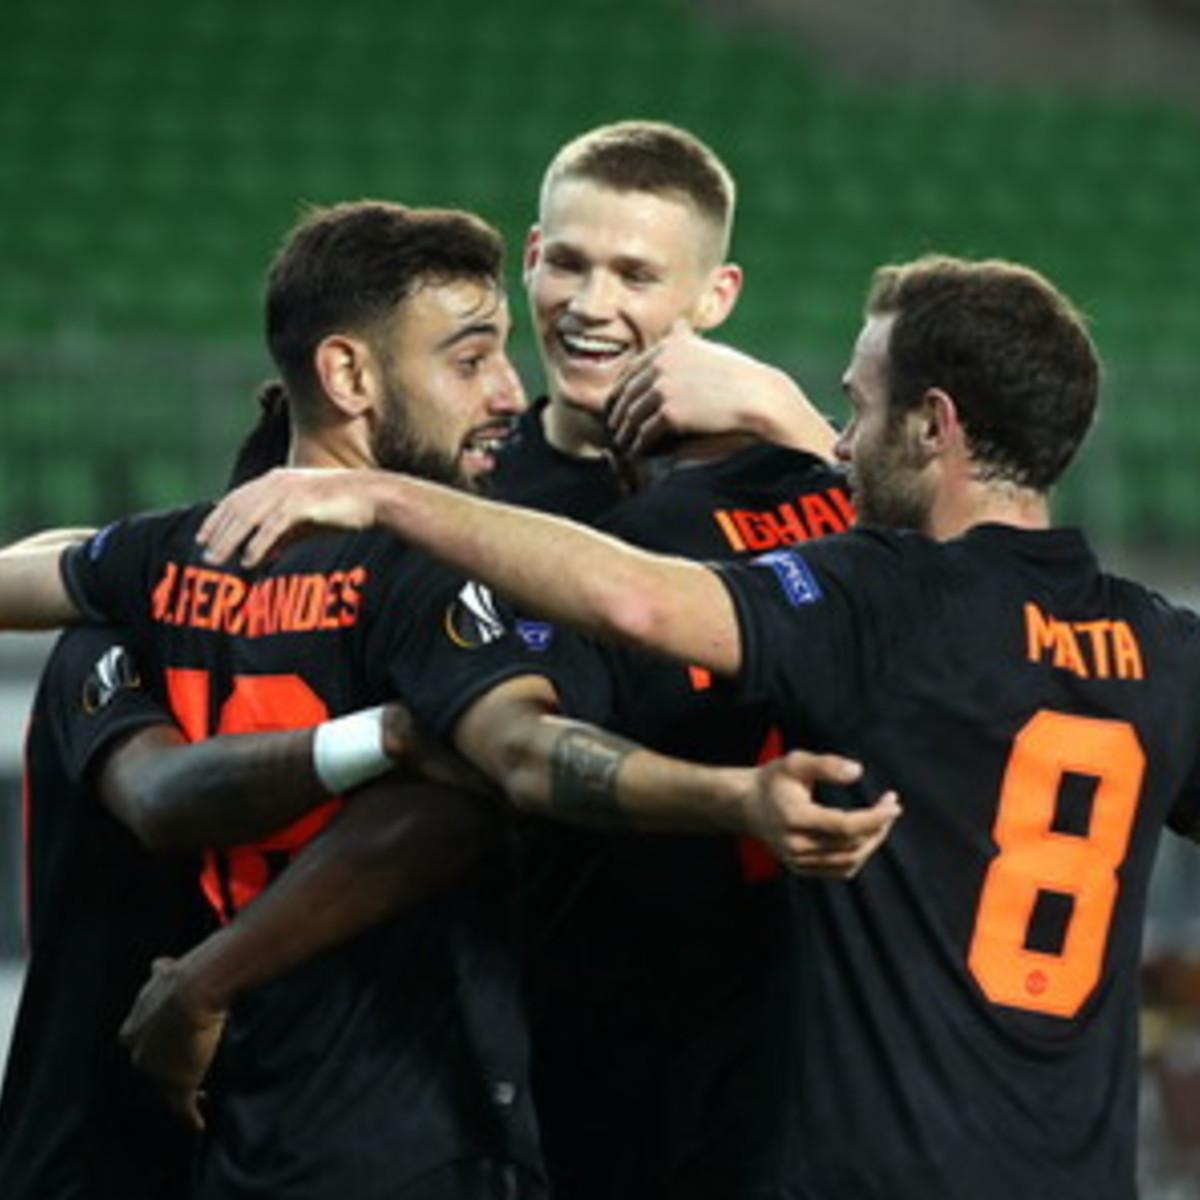 Europa League: Manchester United a valanga sul Lask Linz, il Basilea sorprende l'Eintracht